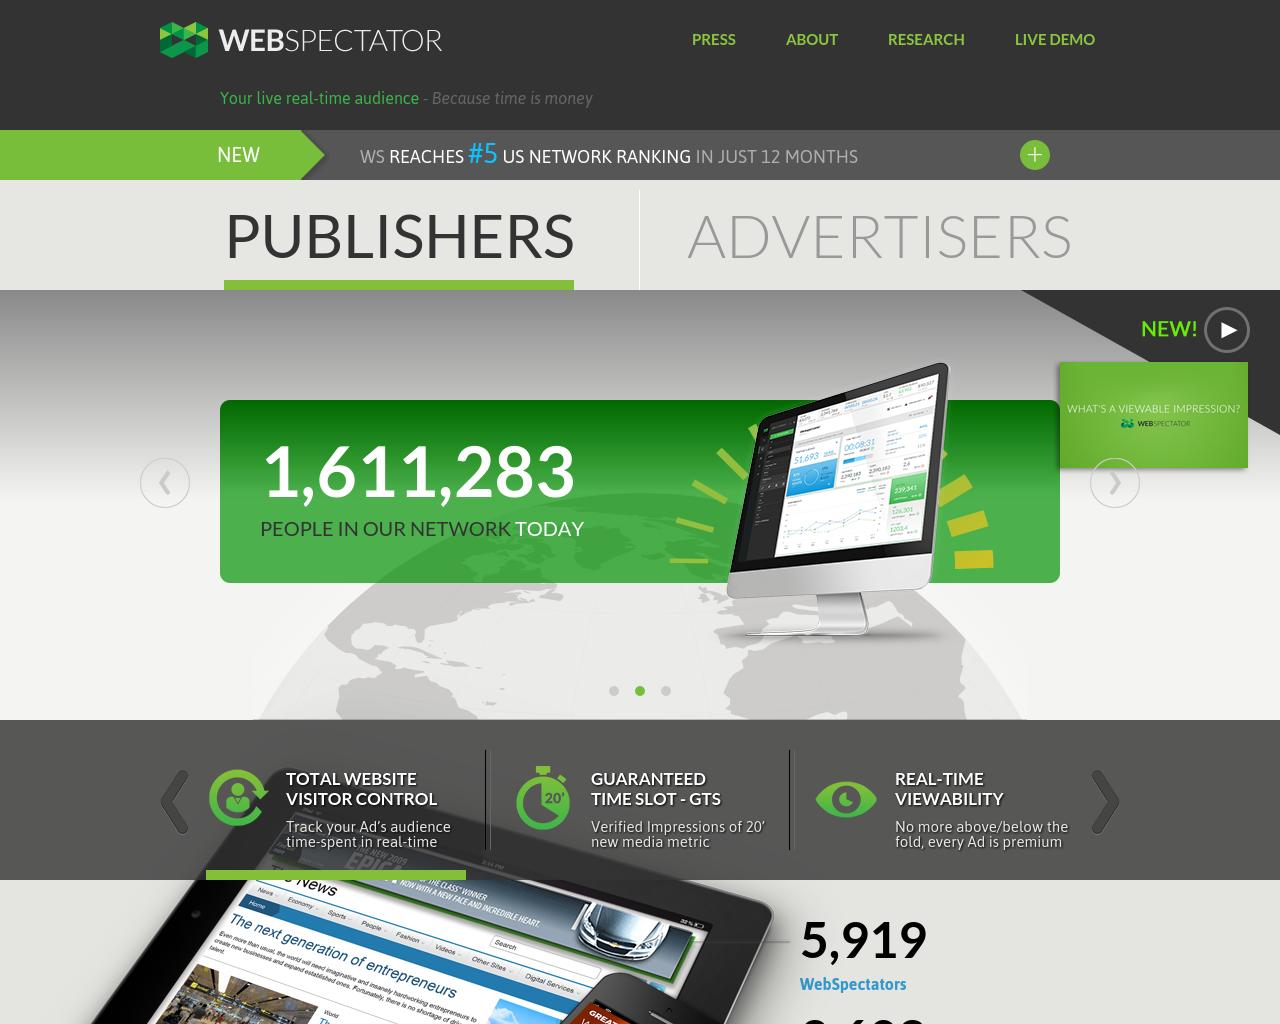 WebSpectator-Corporation-Advertising-Reviews-Pricing